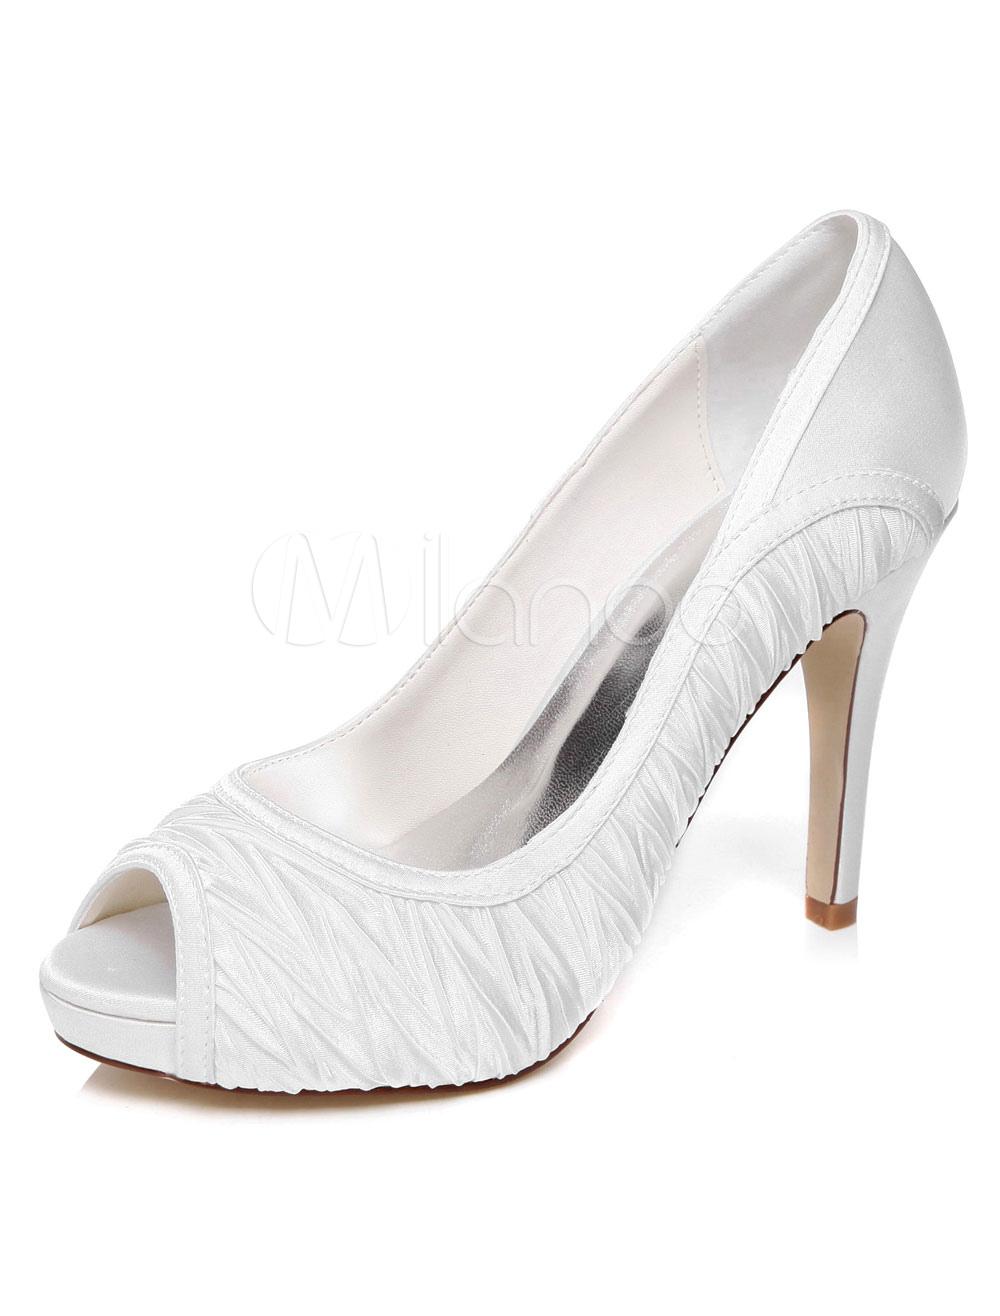 Buy White Satin Platform Peep Toe Bridal Pumps for Women for $72.19 in Milanoo store